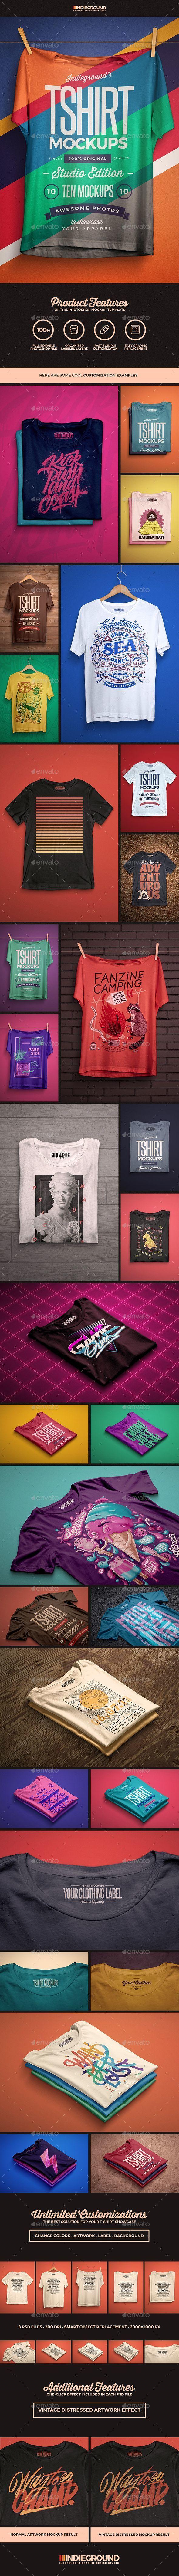 Design t shirt websites - Studio T Shirt Mockups Photoshop Apparel Graphic Design Resources